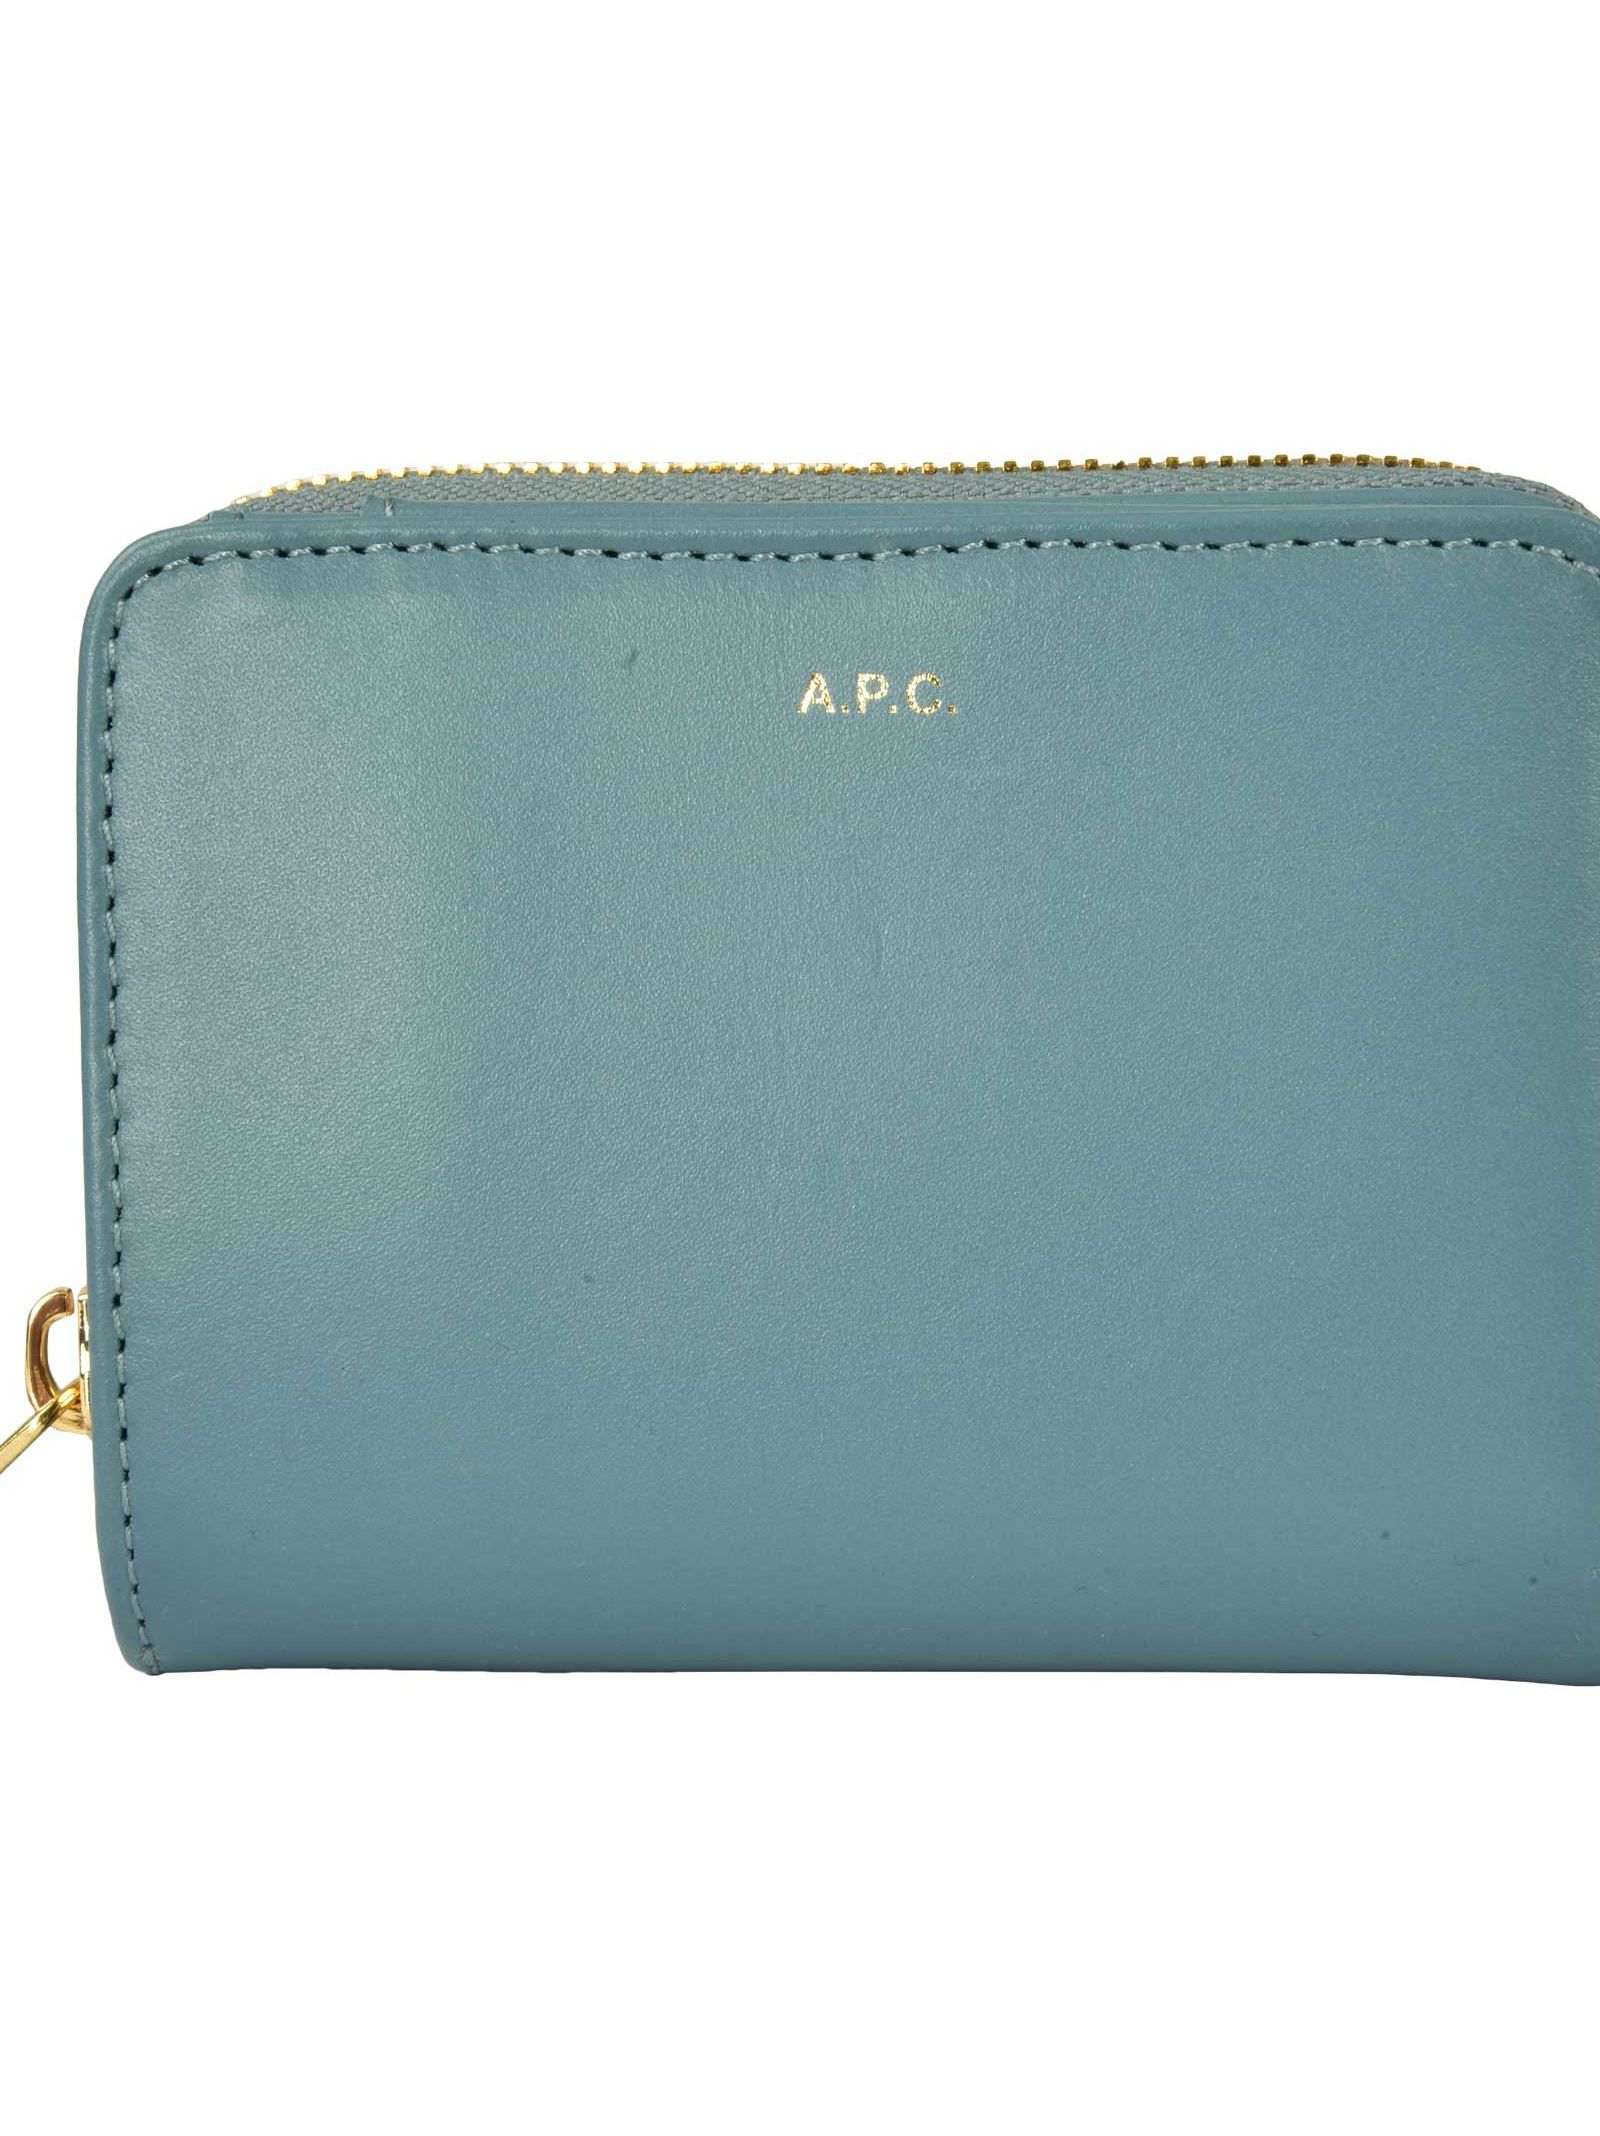 A.P.C. Compact Zip Wallet, Iaa Bleu